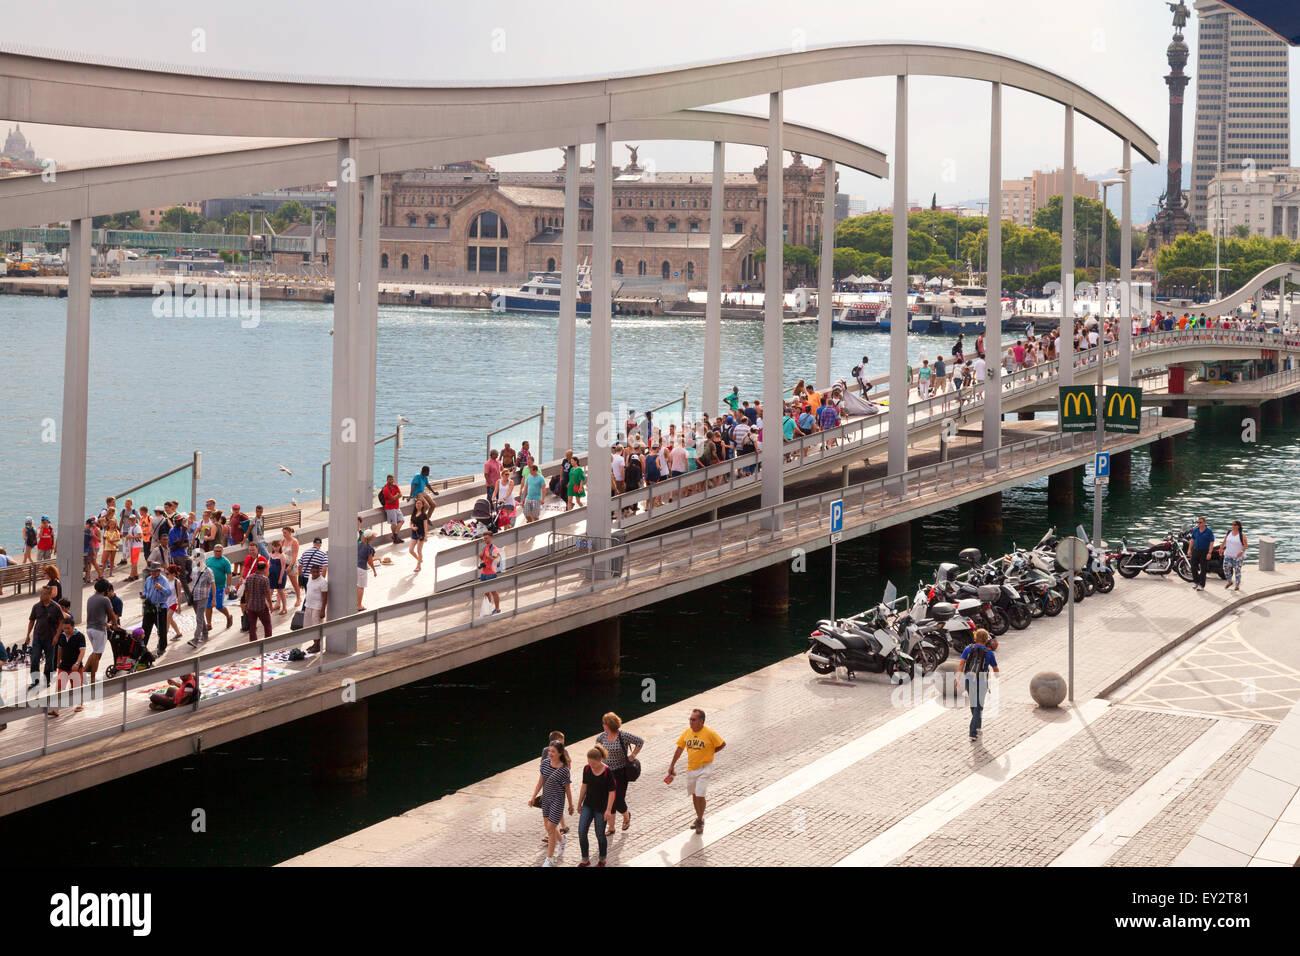 People crossing the bridge on the Rambla de Mar walkway, Port Vell, Barcelona, Spain Europe - Stock Image